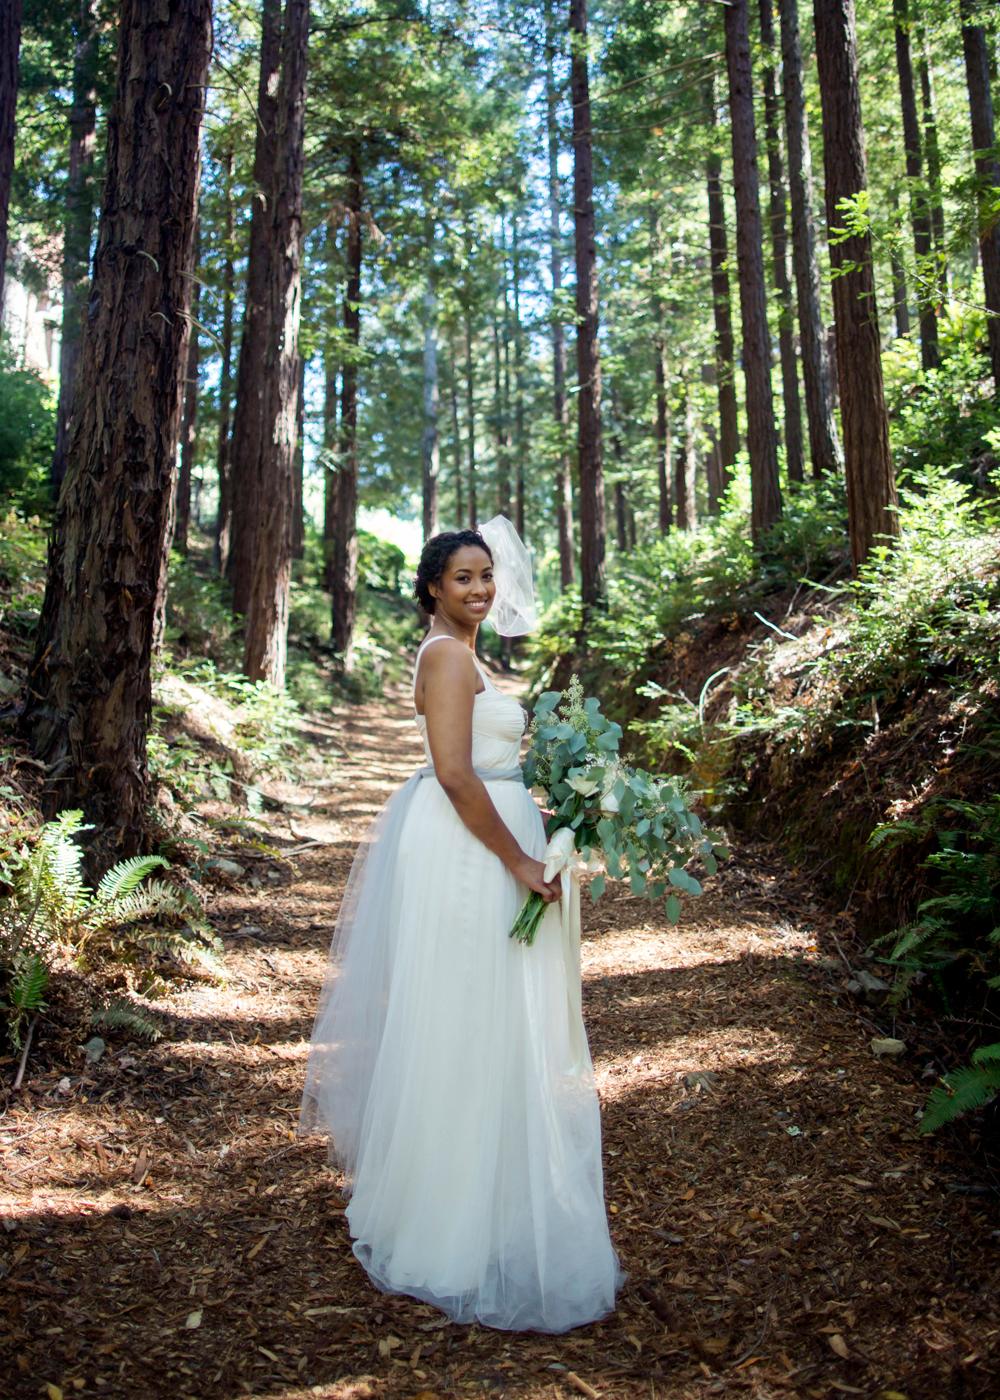 ralston-white-retreat-mill-valley-wedding-photography-lilouette-31.jpg